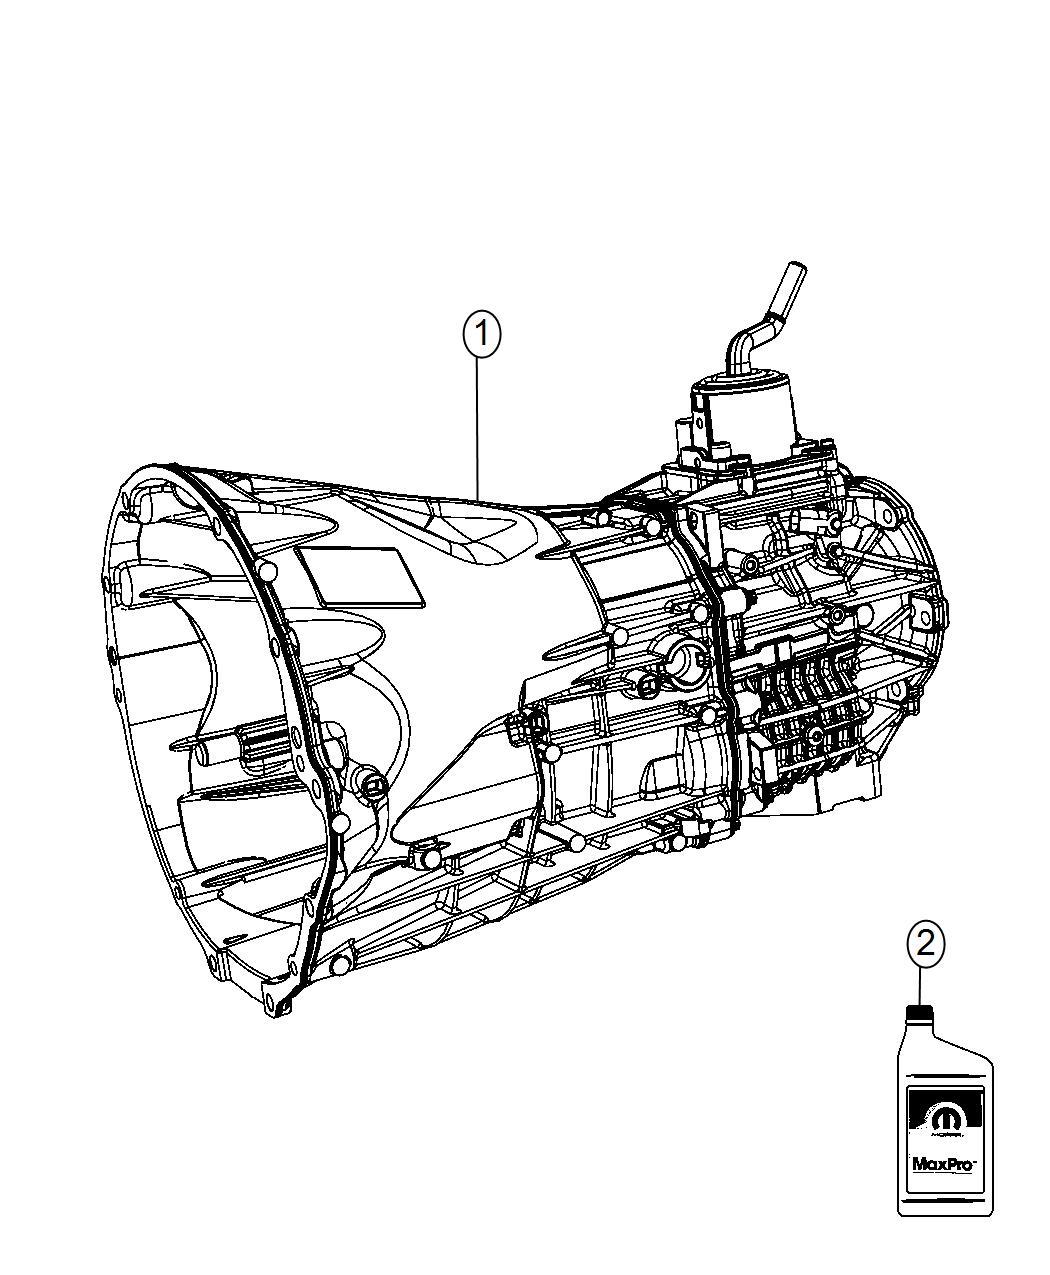 Jeep Wrangler Transmission 6 Speed